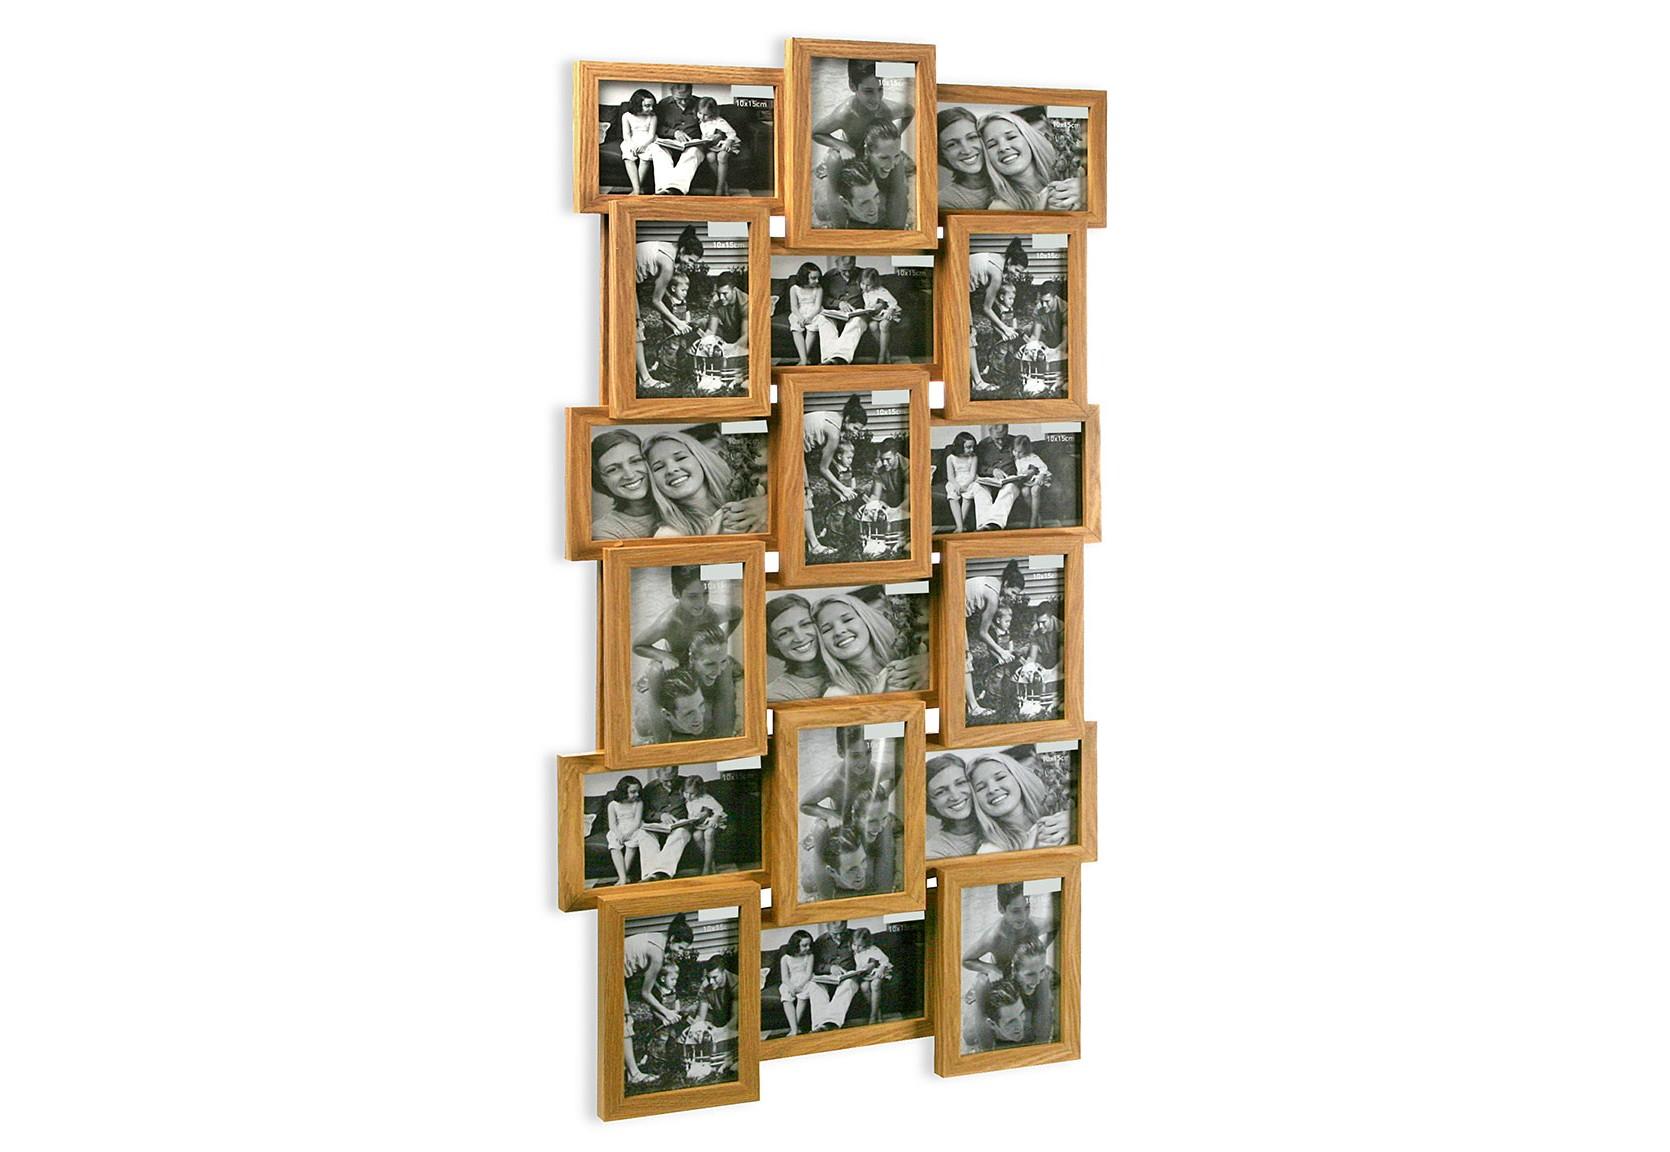 ФоторамкаРамки для фотографий<br><br><br>Material: Дерево<br>Length см: None<br>Width см: 44<br>Depth см: 4<br>Height см: 85